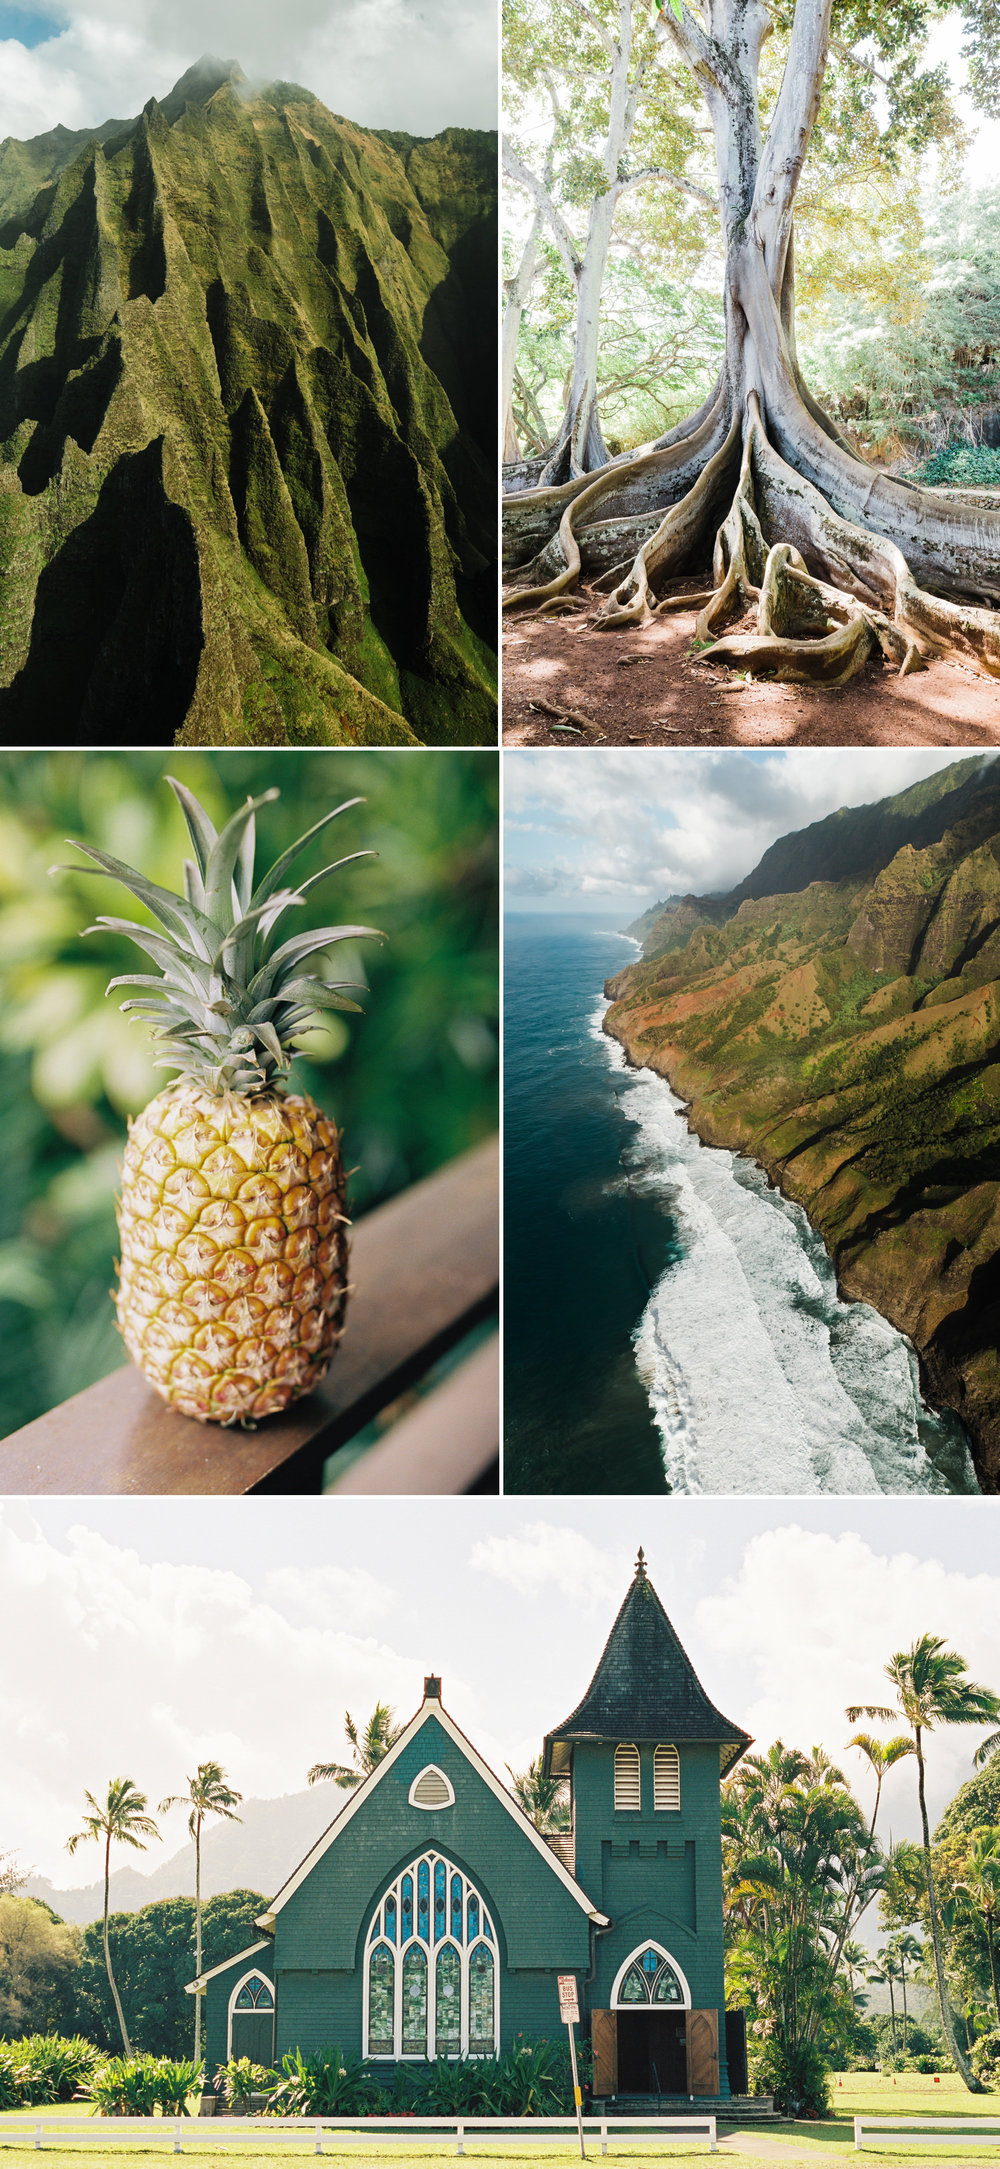 cameron-zegers-photography-travel-hawaii-kauai-5.jpg